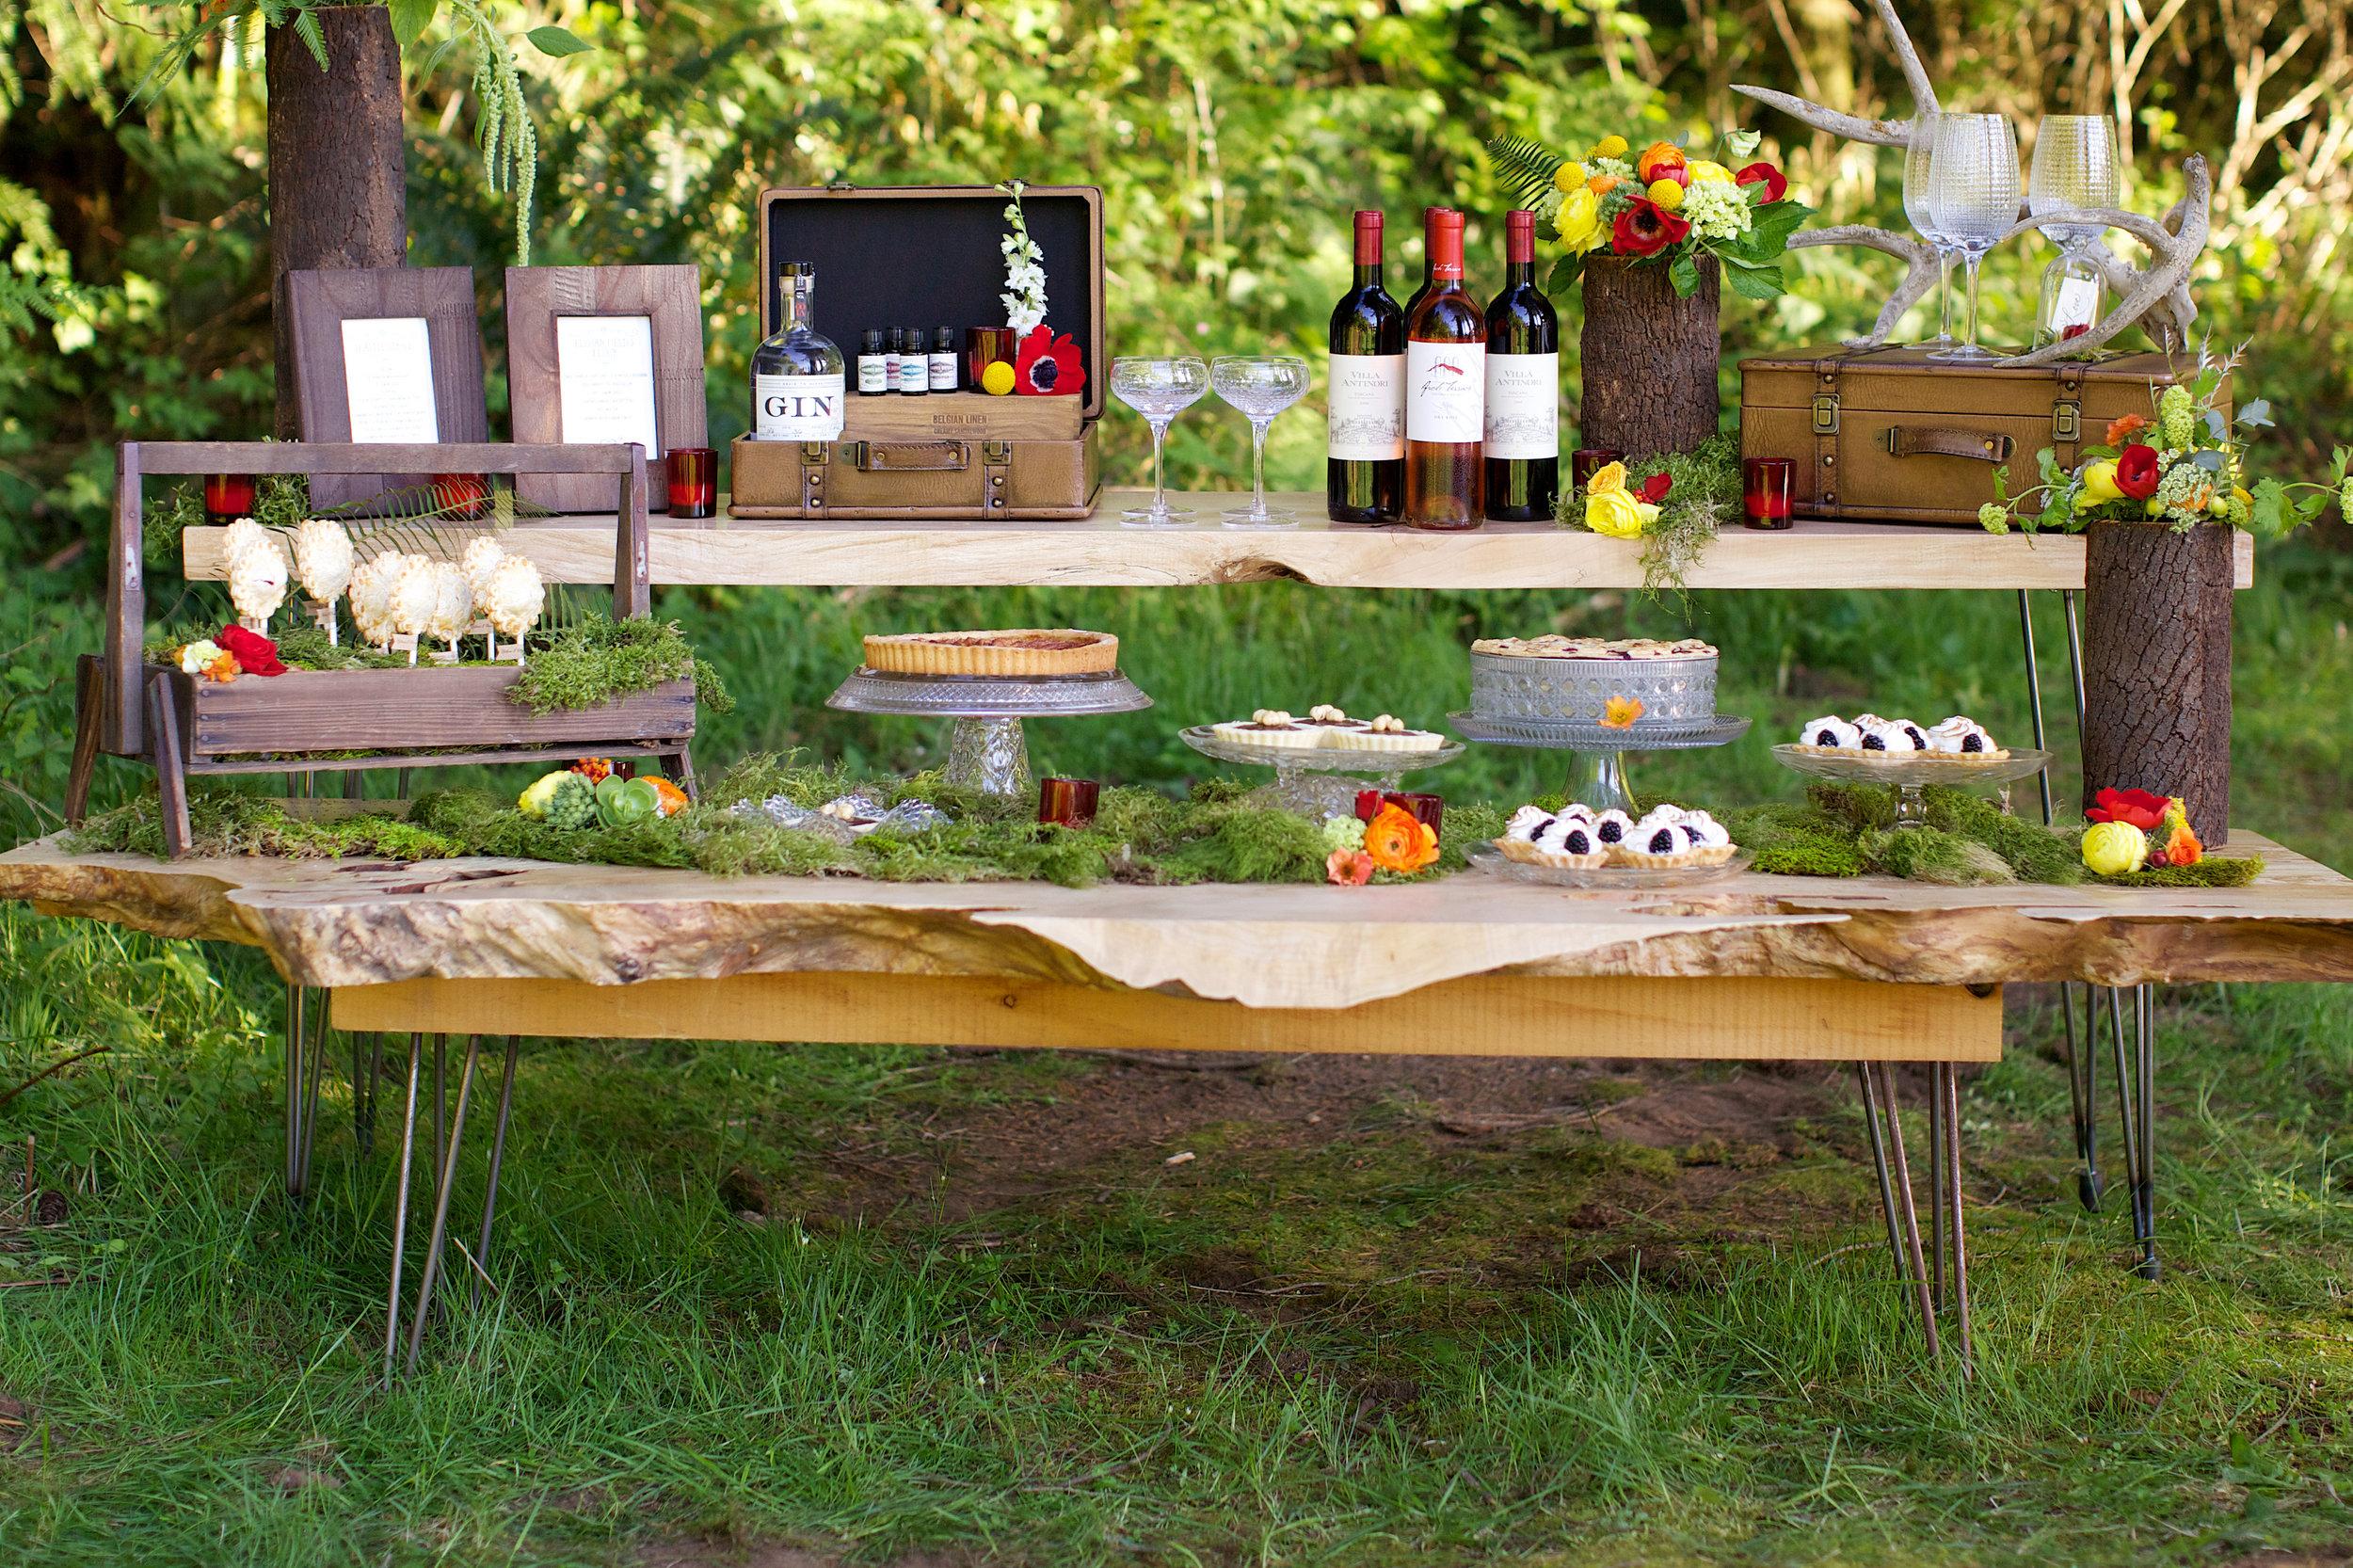 View More: http://rickplusanna.pass.us/naturalnorthweststyledshoot